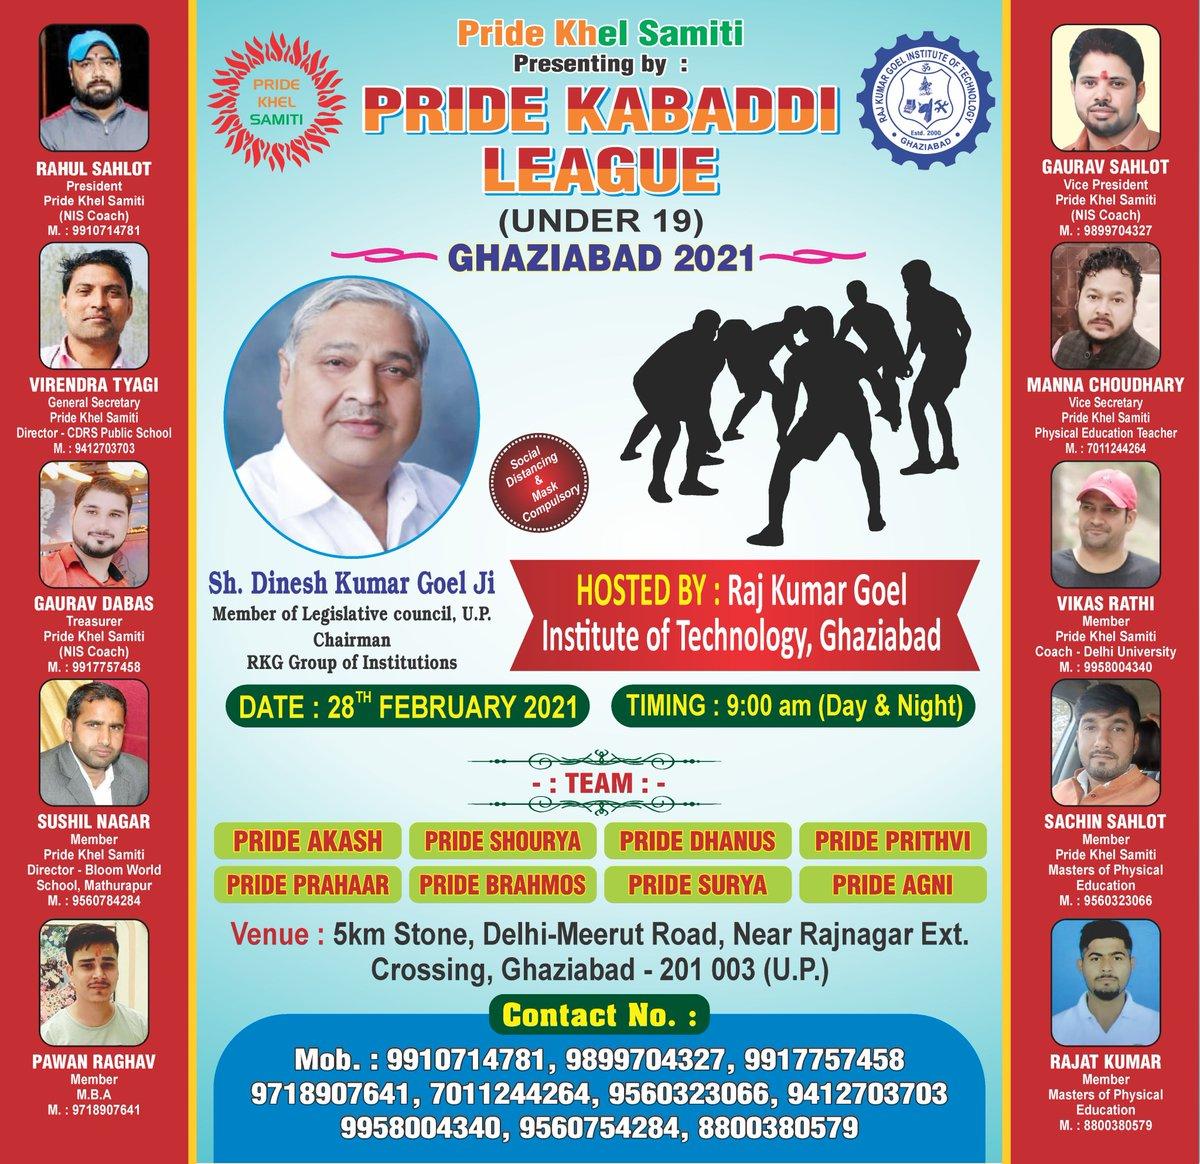 Pride Khel Samiti Presenting by -  Pride Kabaddi League UNDER 19 GHAZIABAD 2021 Hosted by Raj Kumar Goel Institute of Technology Ghaziabad Rkgit Ghaziabad  #kabaddi #prokabaddi #kabaddikabaddi #kabaddiplayer #kabadditeam @ProKabaddi  @KabaddiAdda  @Super_Kabaddi @IndiaKabaddi